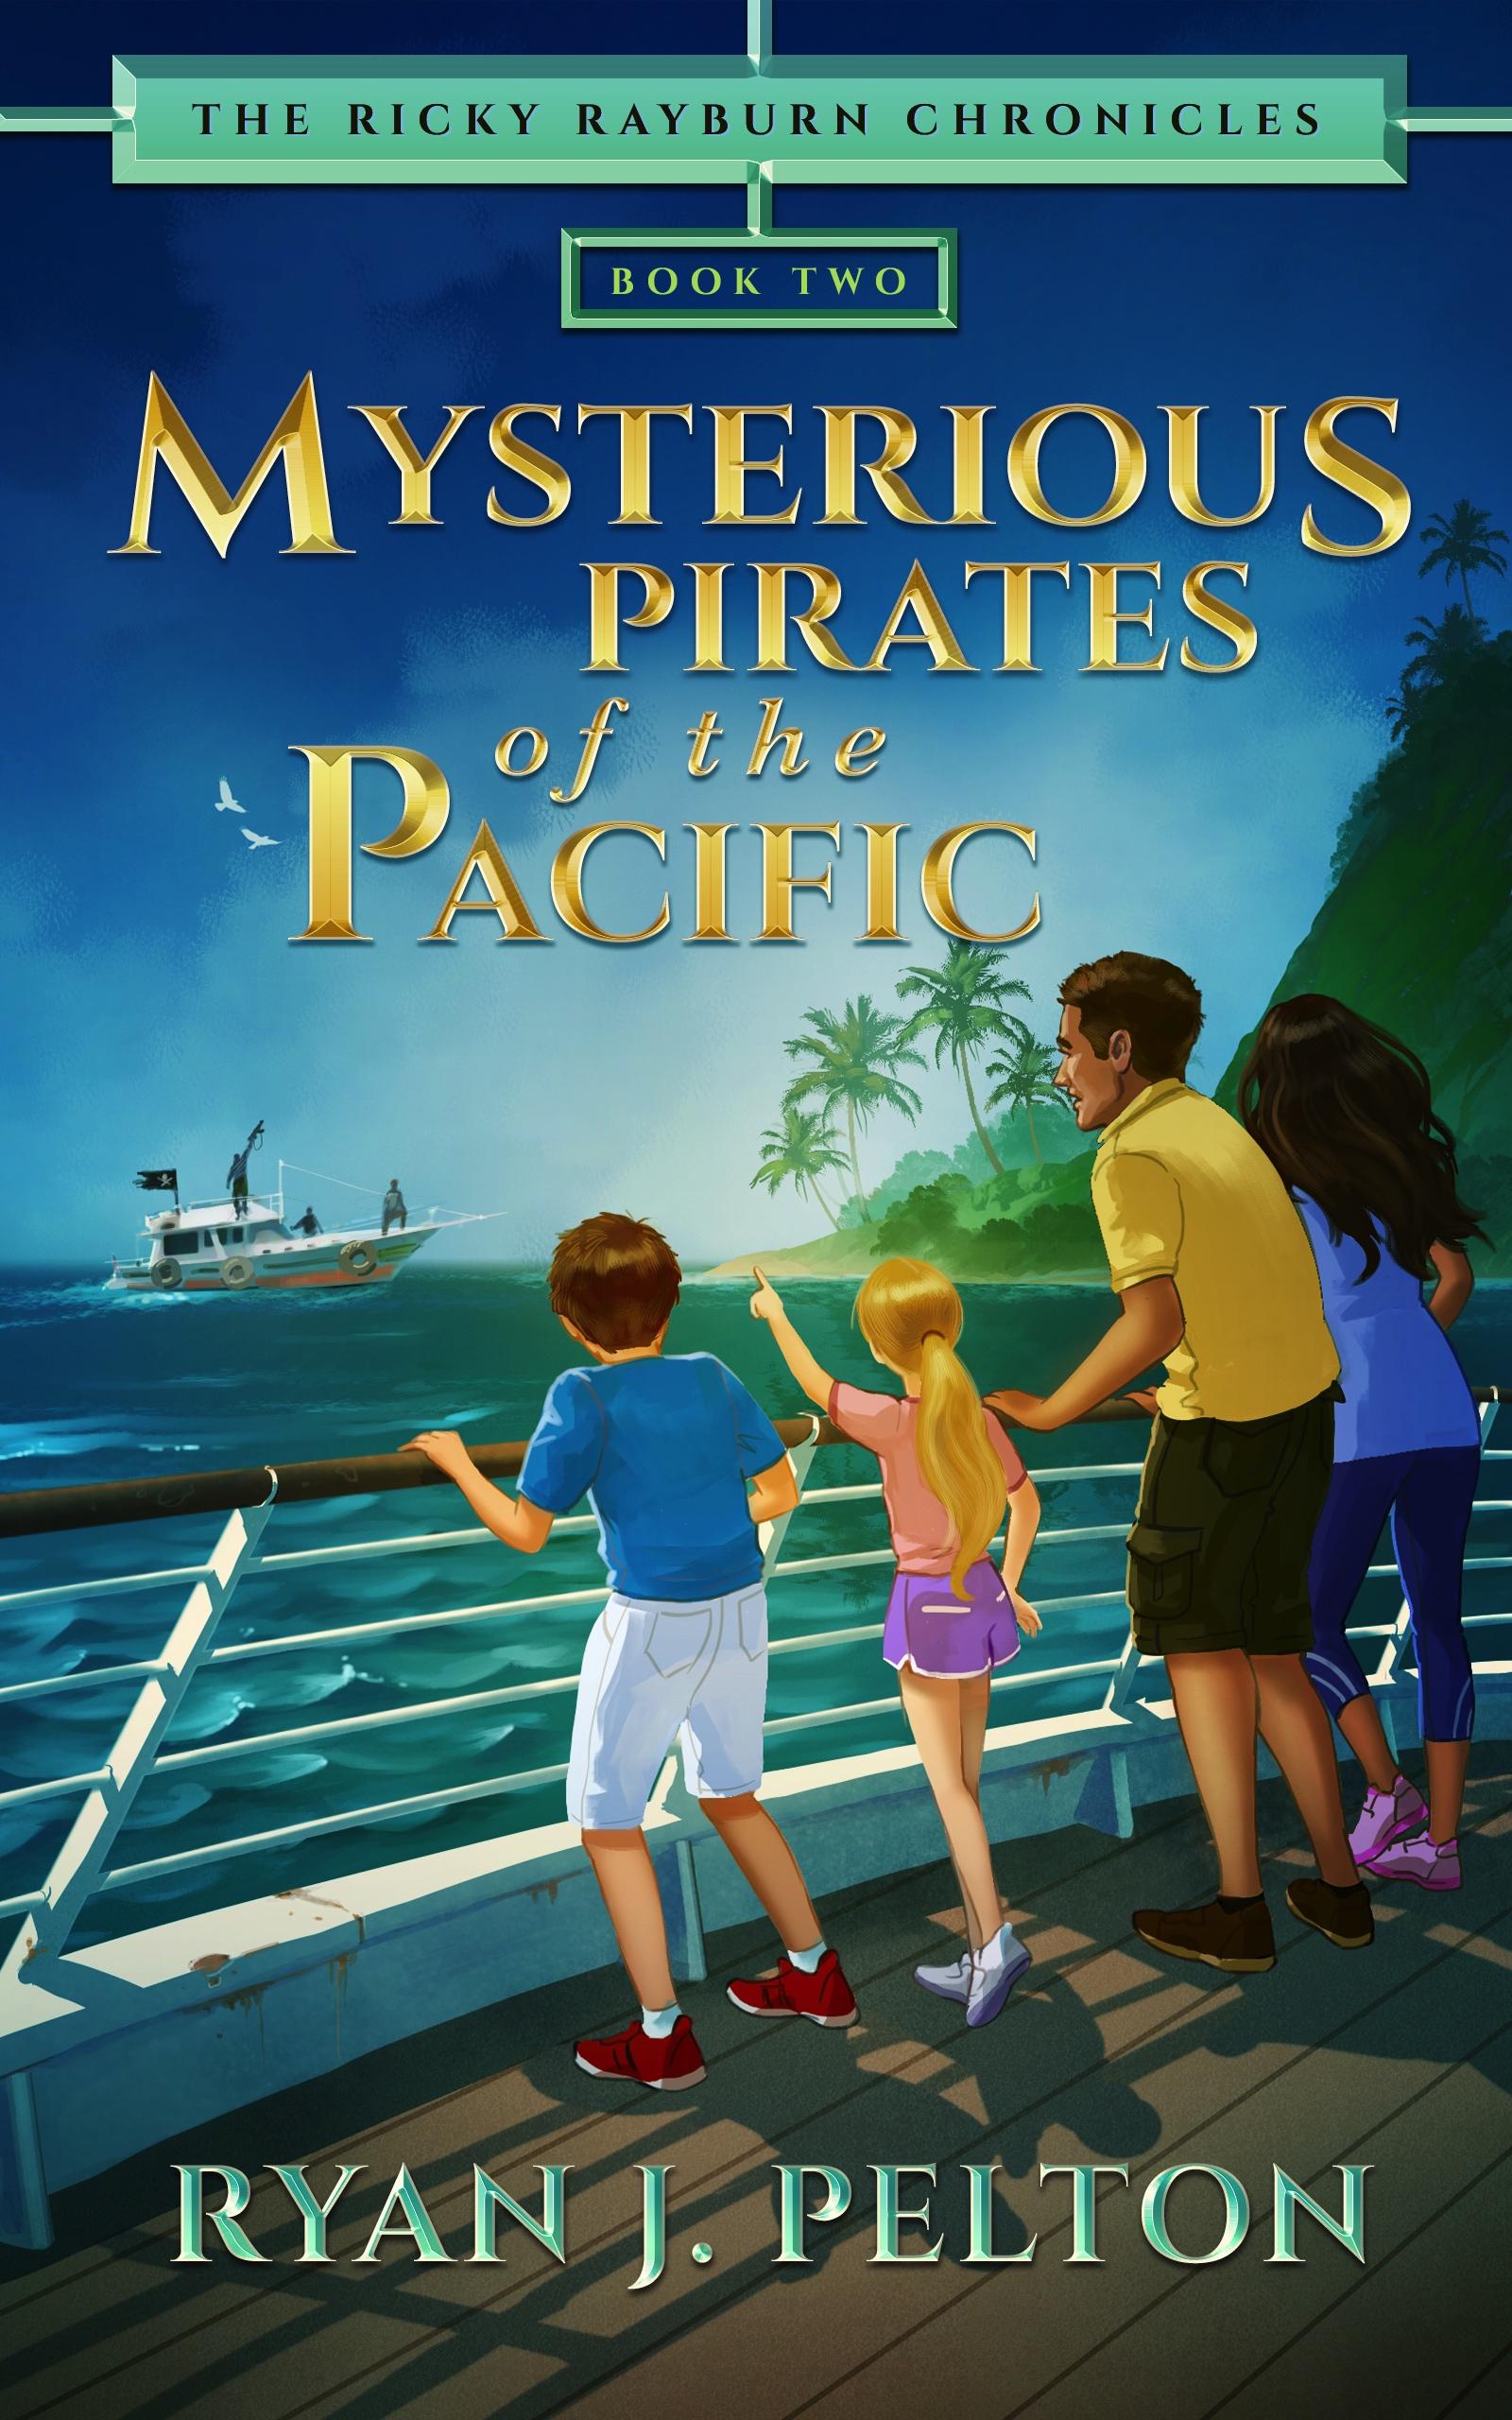 Middle Grade Fiction (7-12), Action Adventure